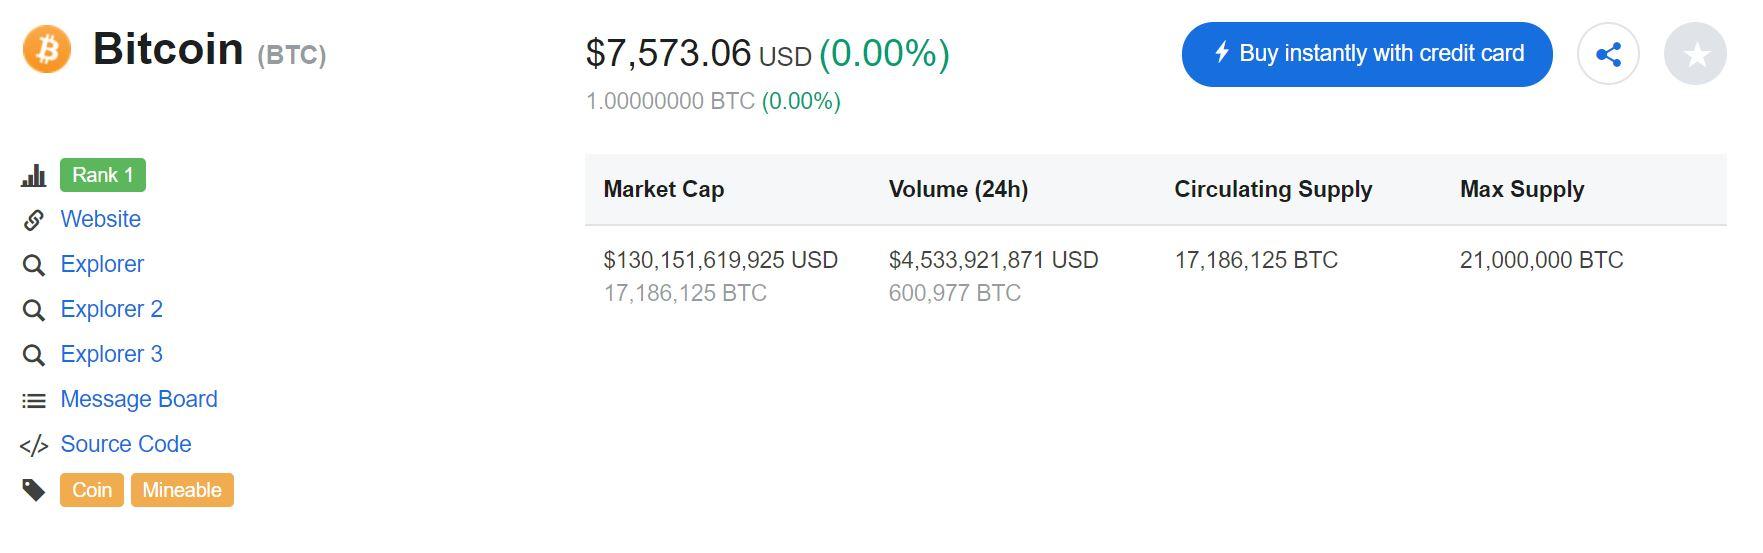 Bitcoin Staves Off Drop Under $7,500, Investors Remain Bullish 13